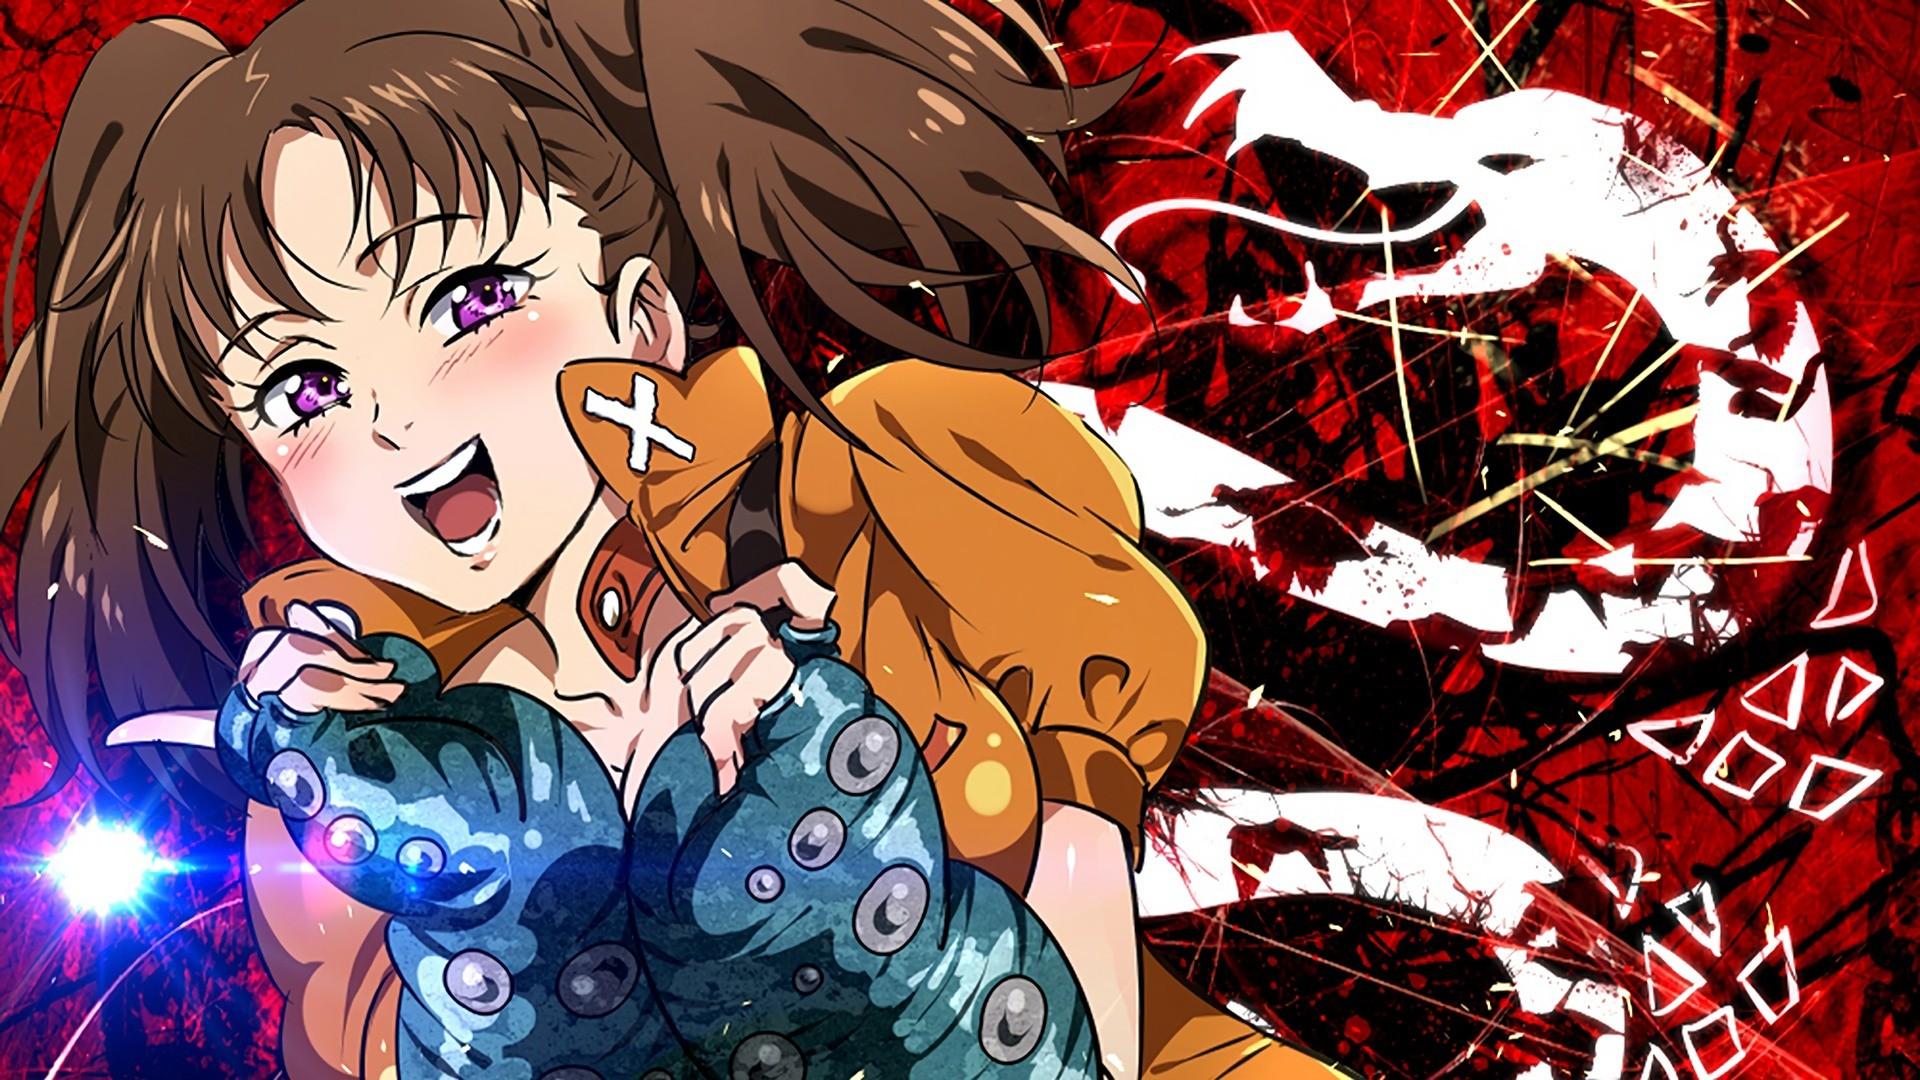 This wallpaper has tags of Diane, Nanatsu No Taizai the Seven Deadly Sins,  Anime, Girls,